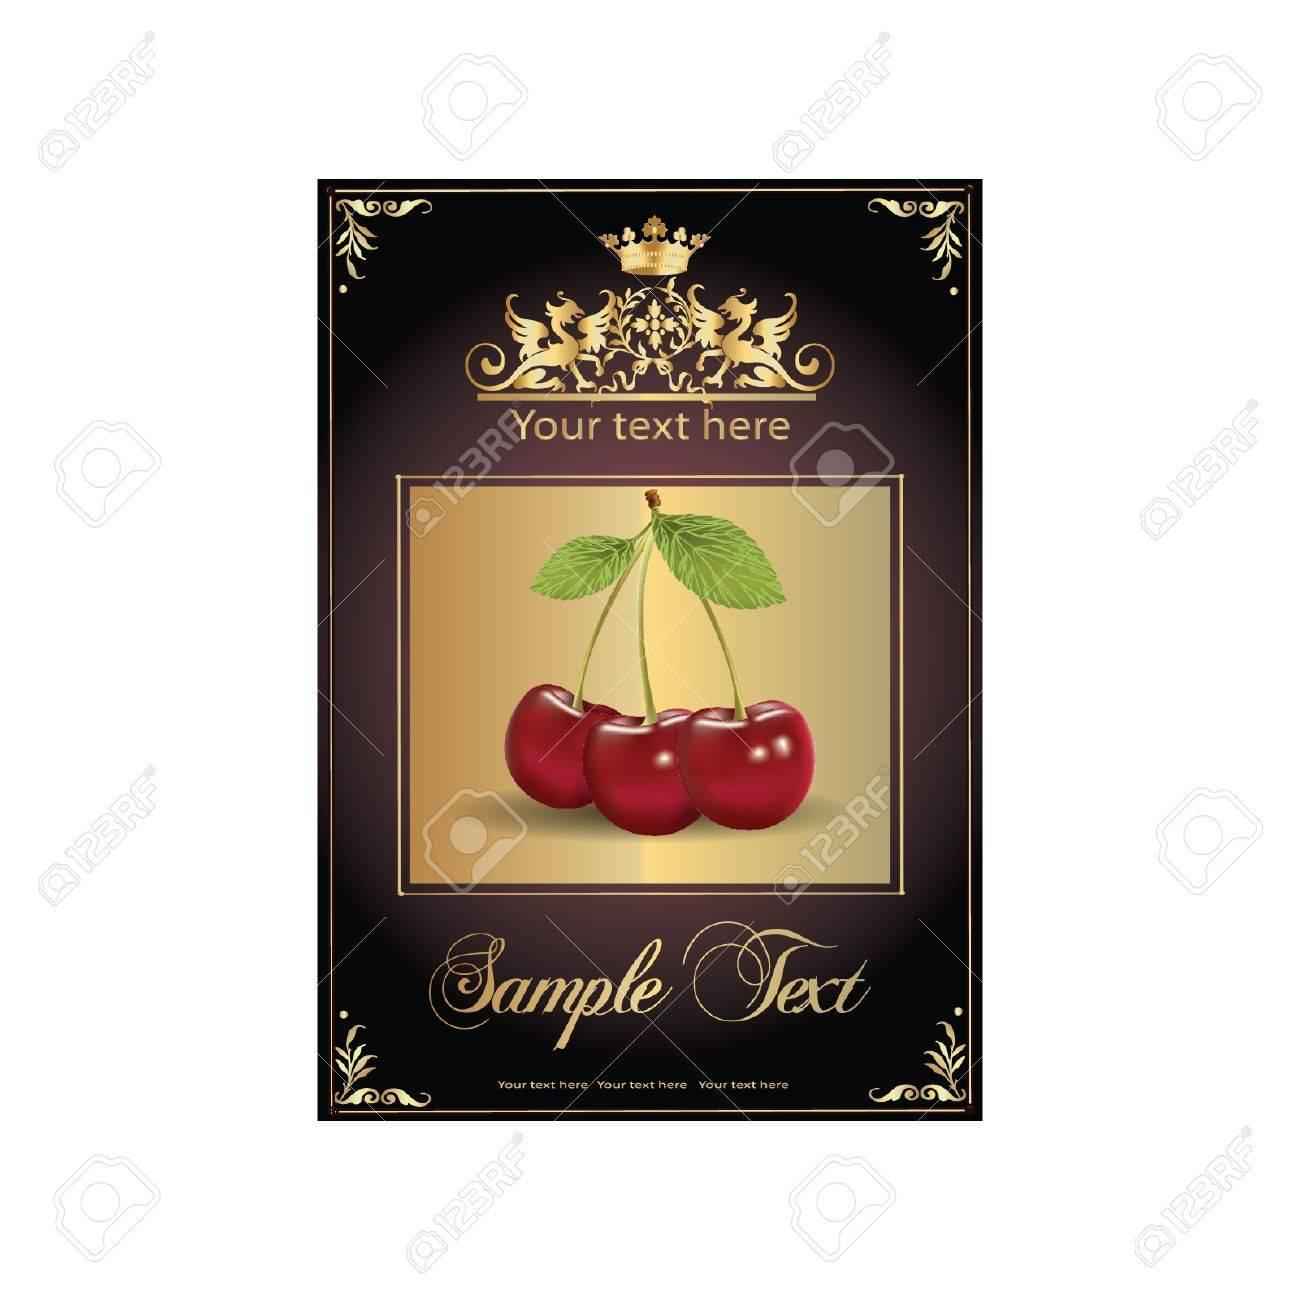 ripe, delicious cherries. beautiful label Stock Vector - 11142465